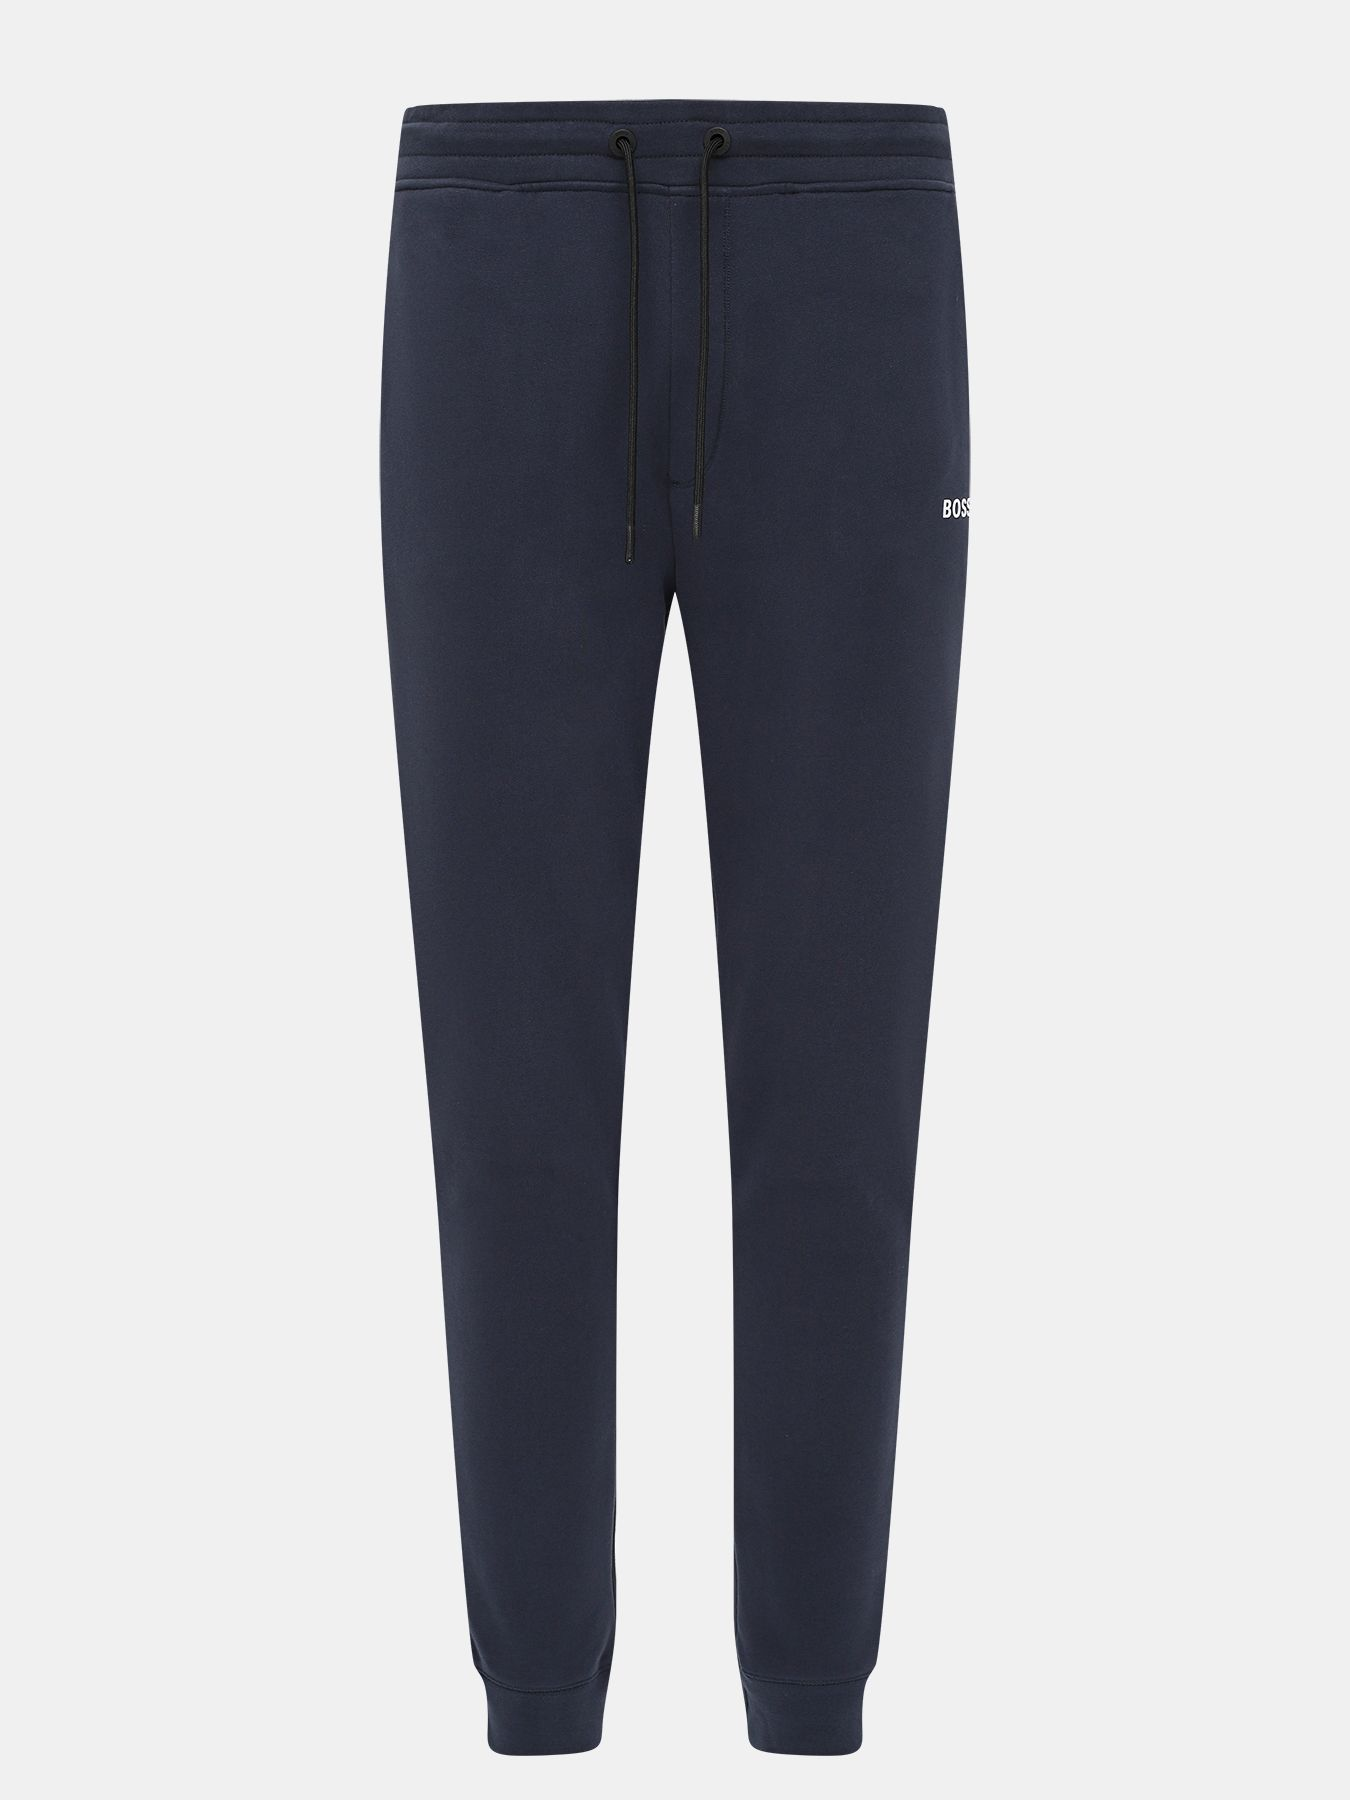 Спортивные брюки BOSS Брюки Skeevo брюки boss брюки на резинке banks